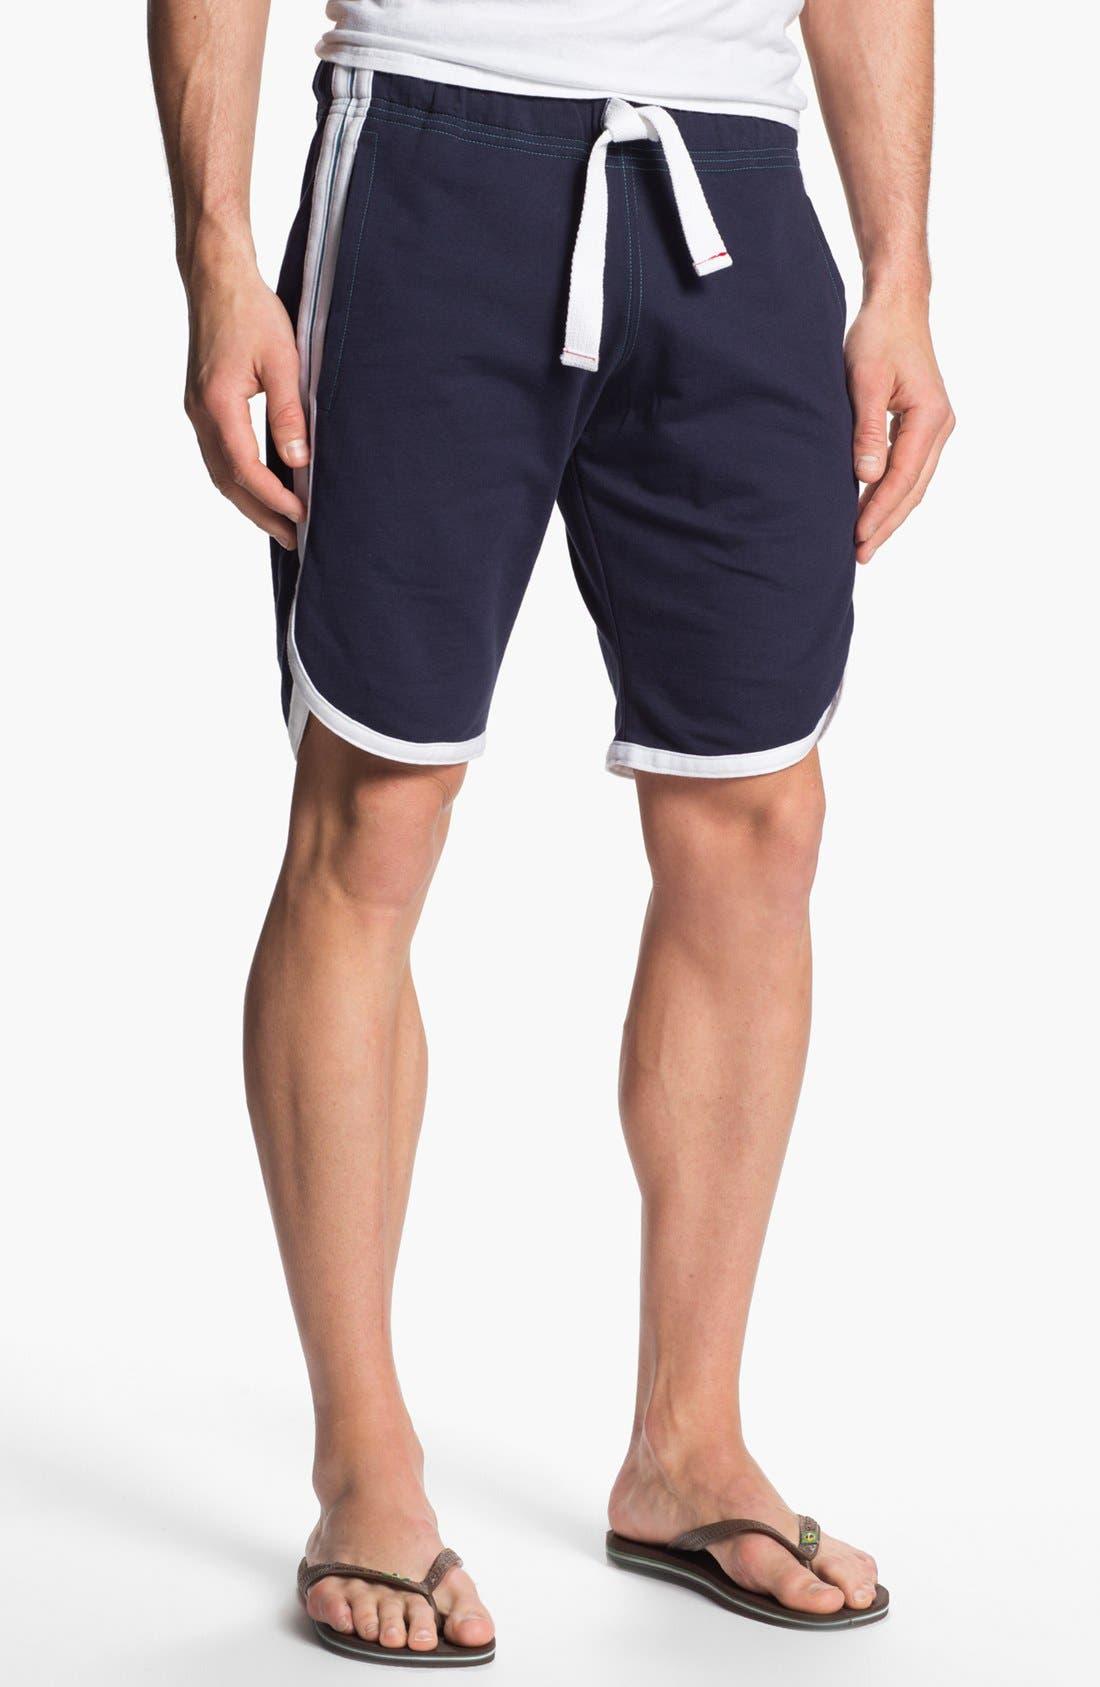 Main Image - Andrew Christian Retro Athletic Shorts